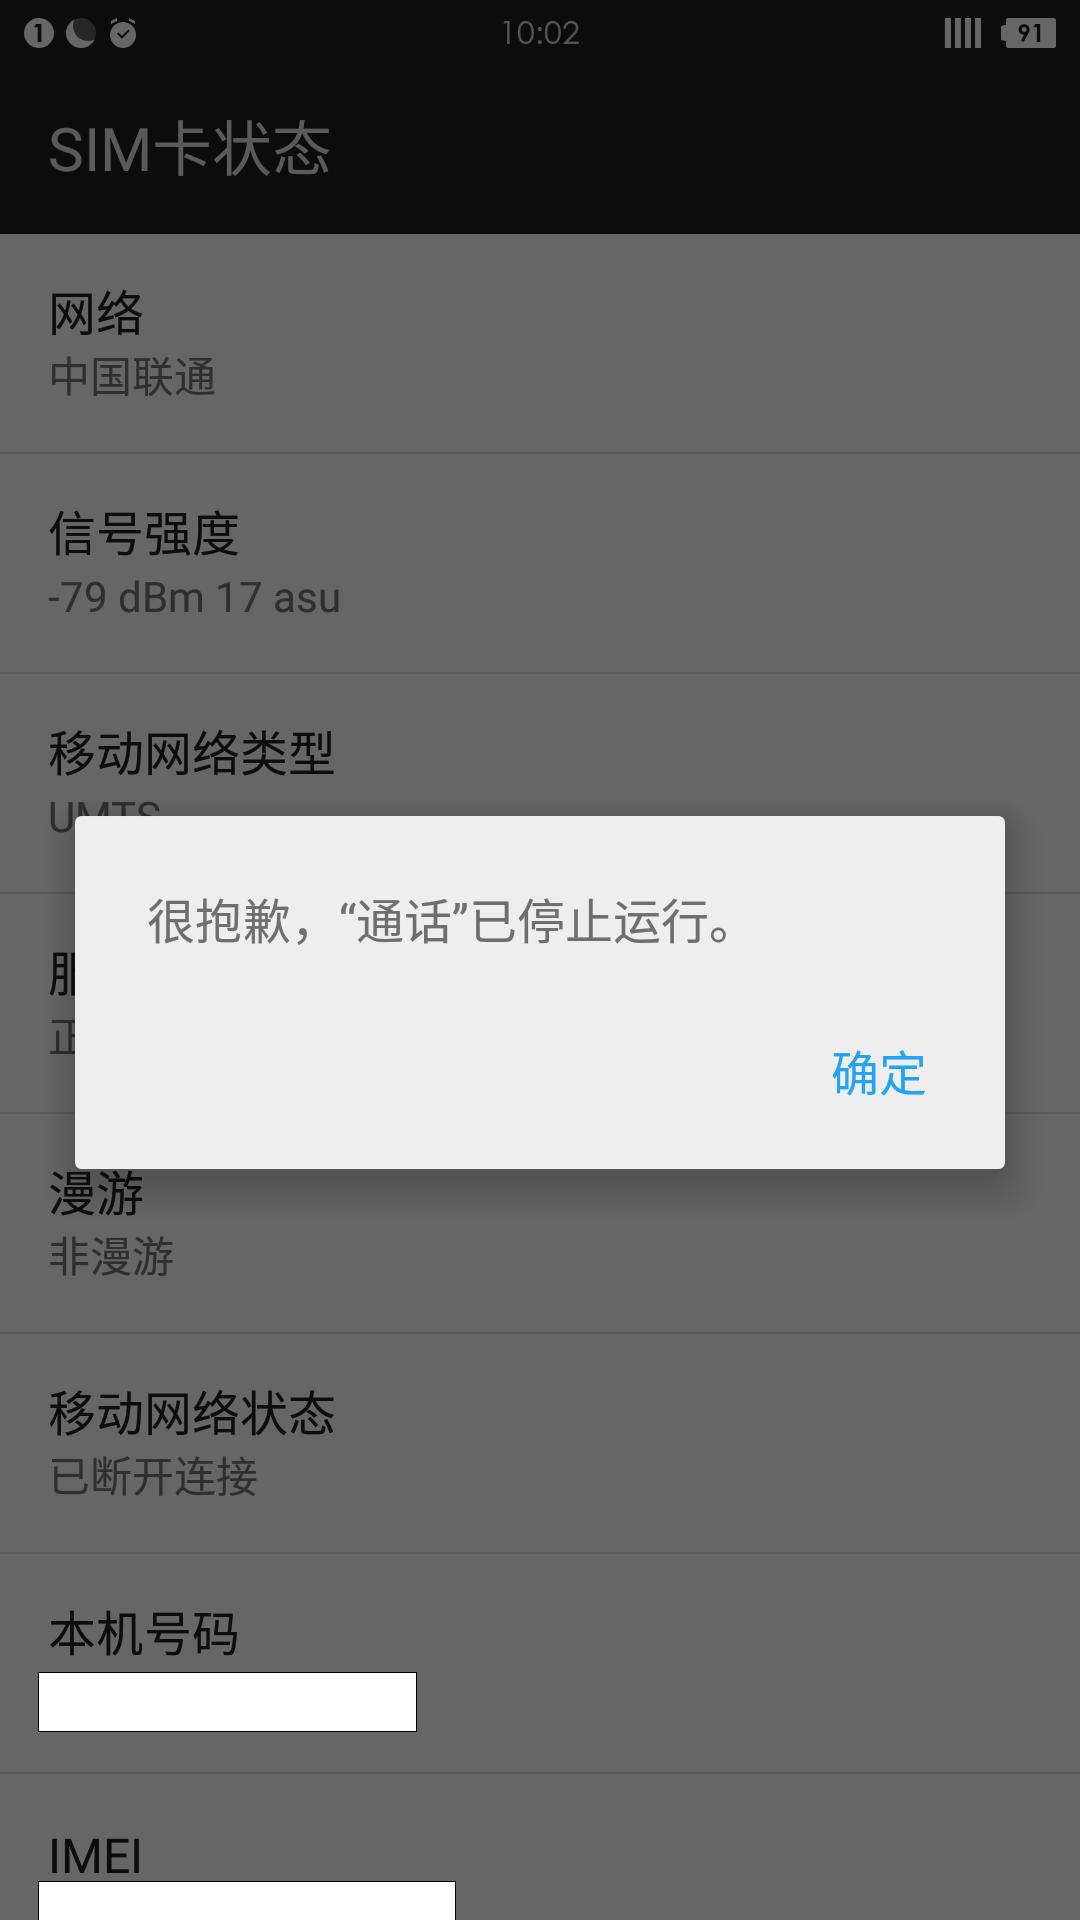 Screenshot_2015-09-25-10-02-36.png